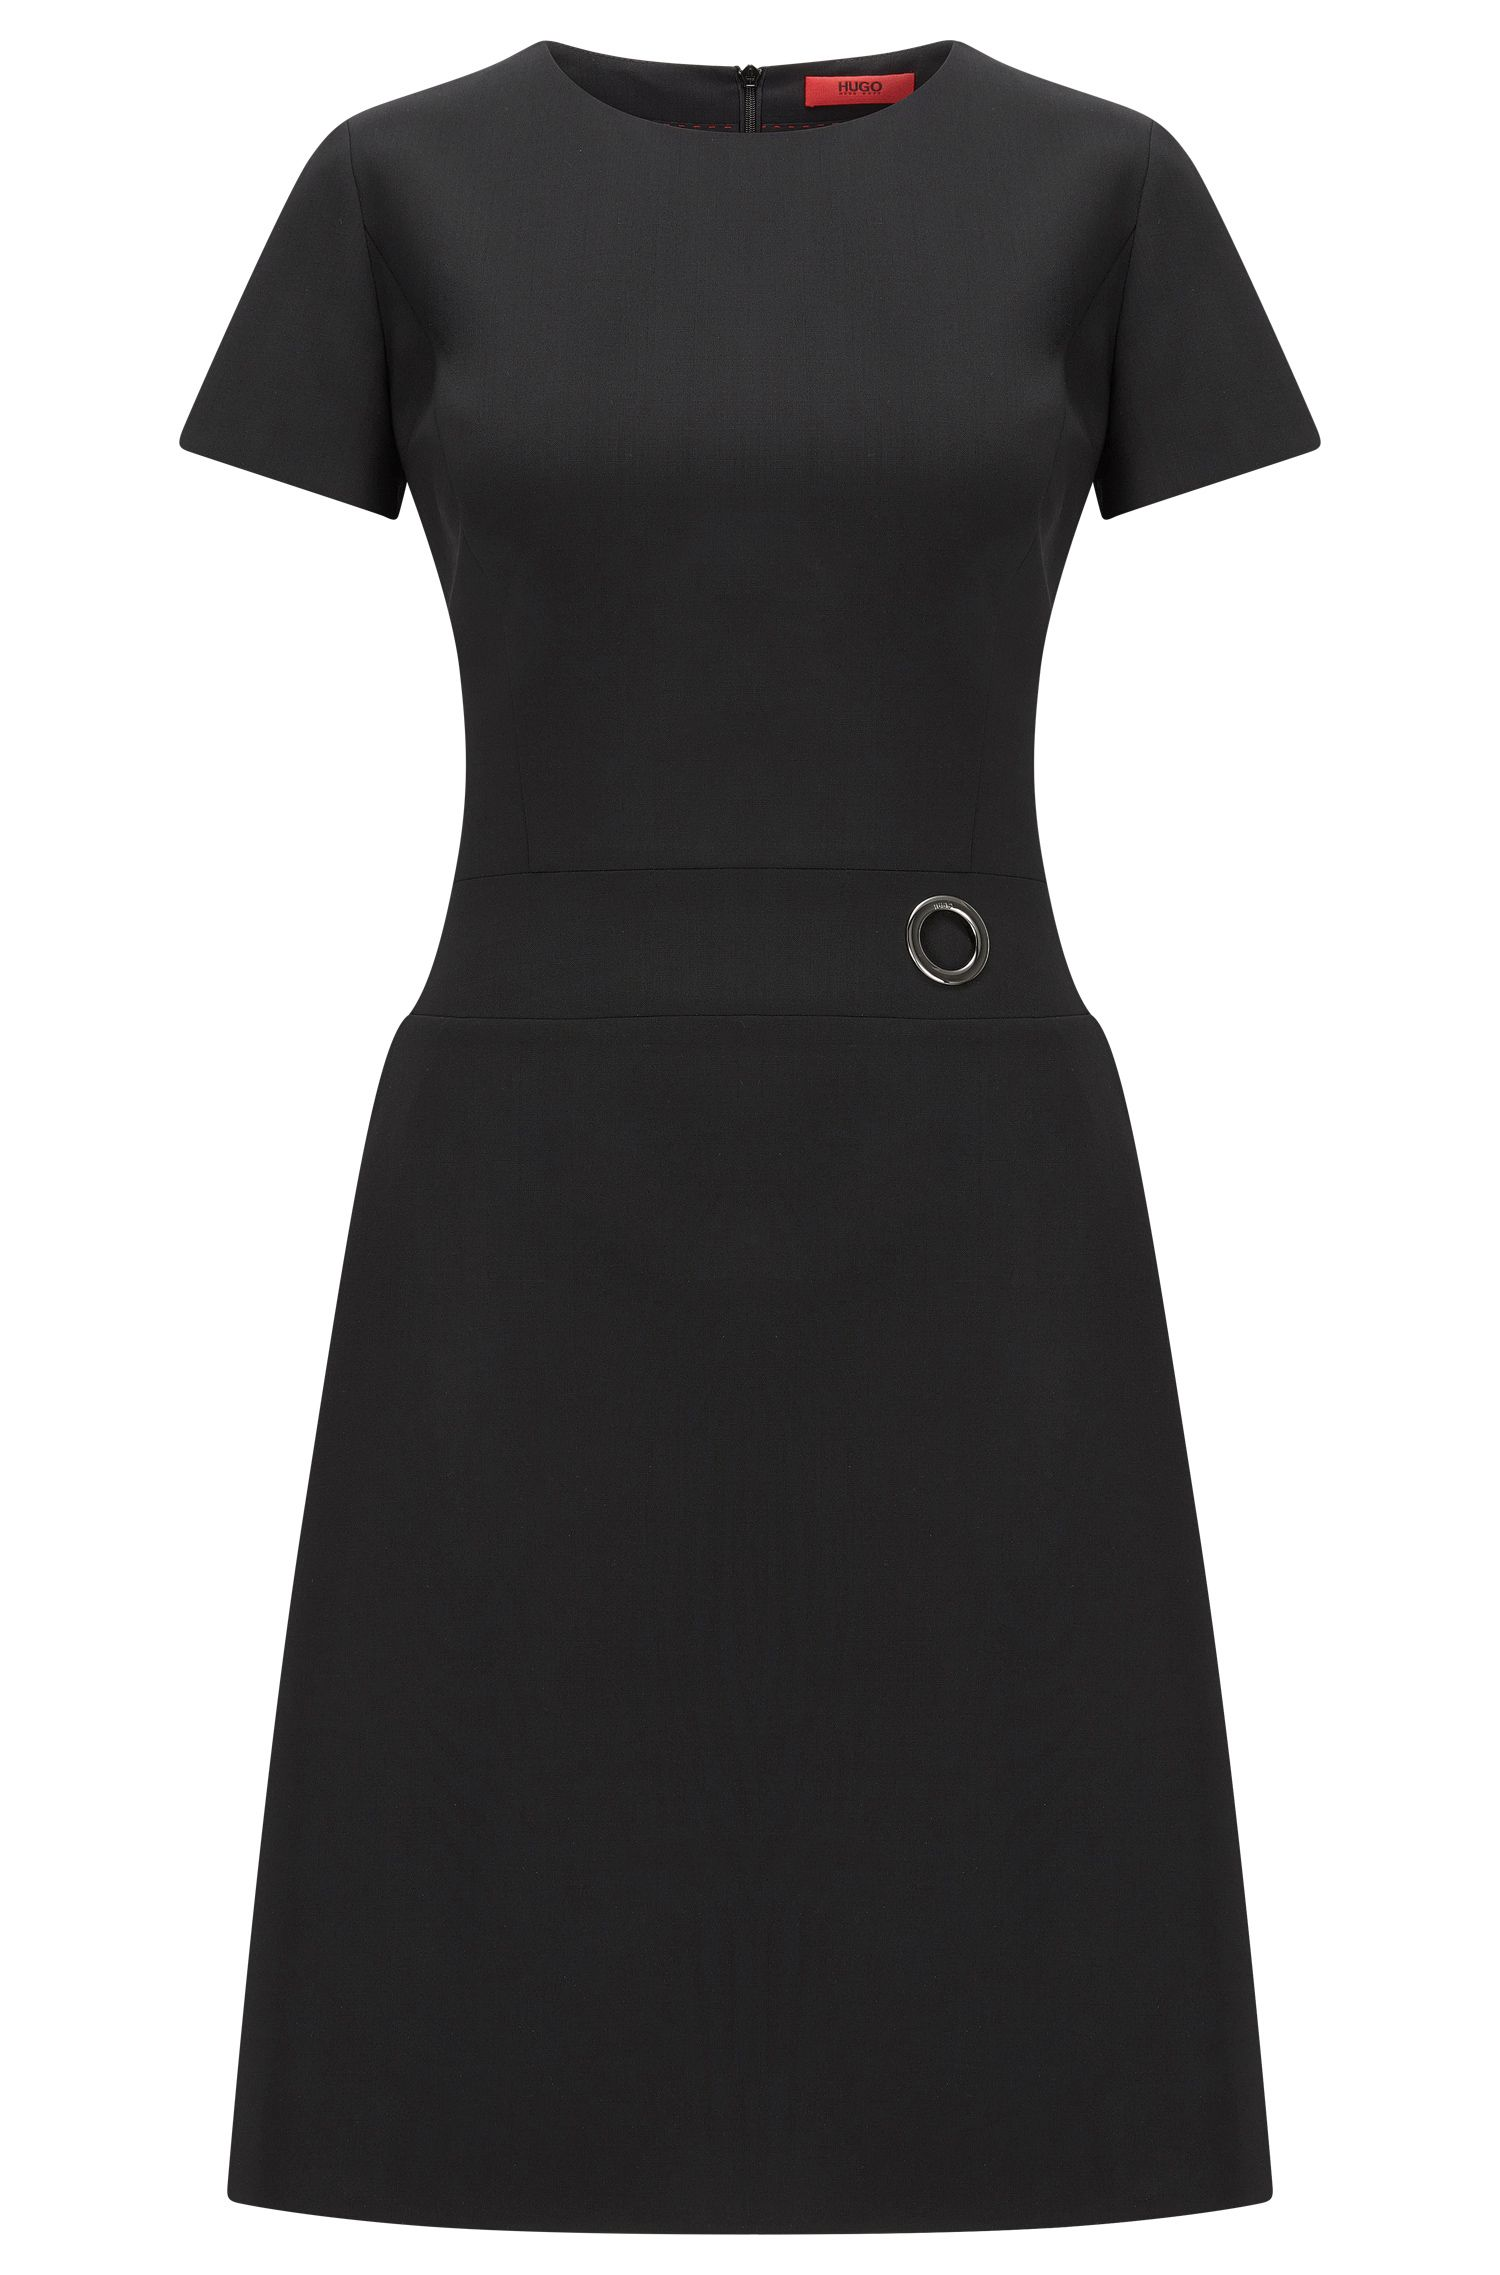 'Kajella' | Stretch Virgin Wool Dress